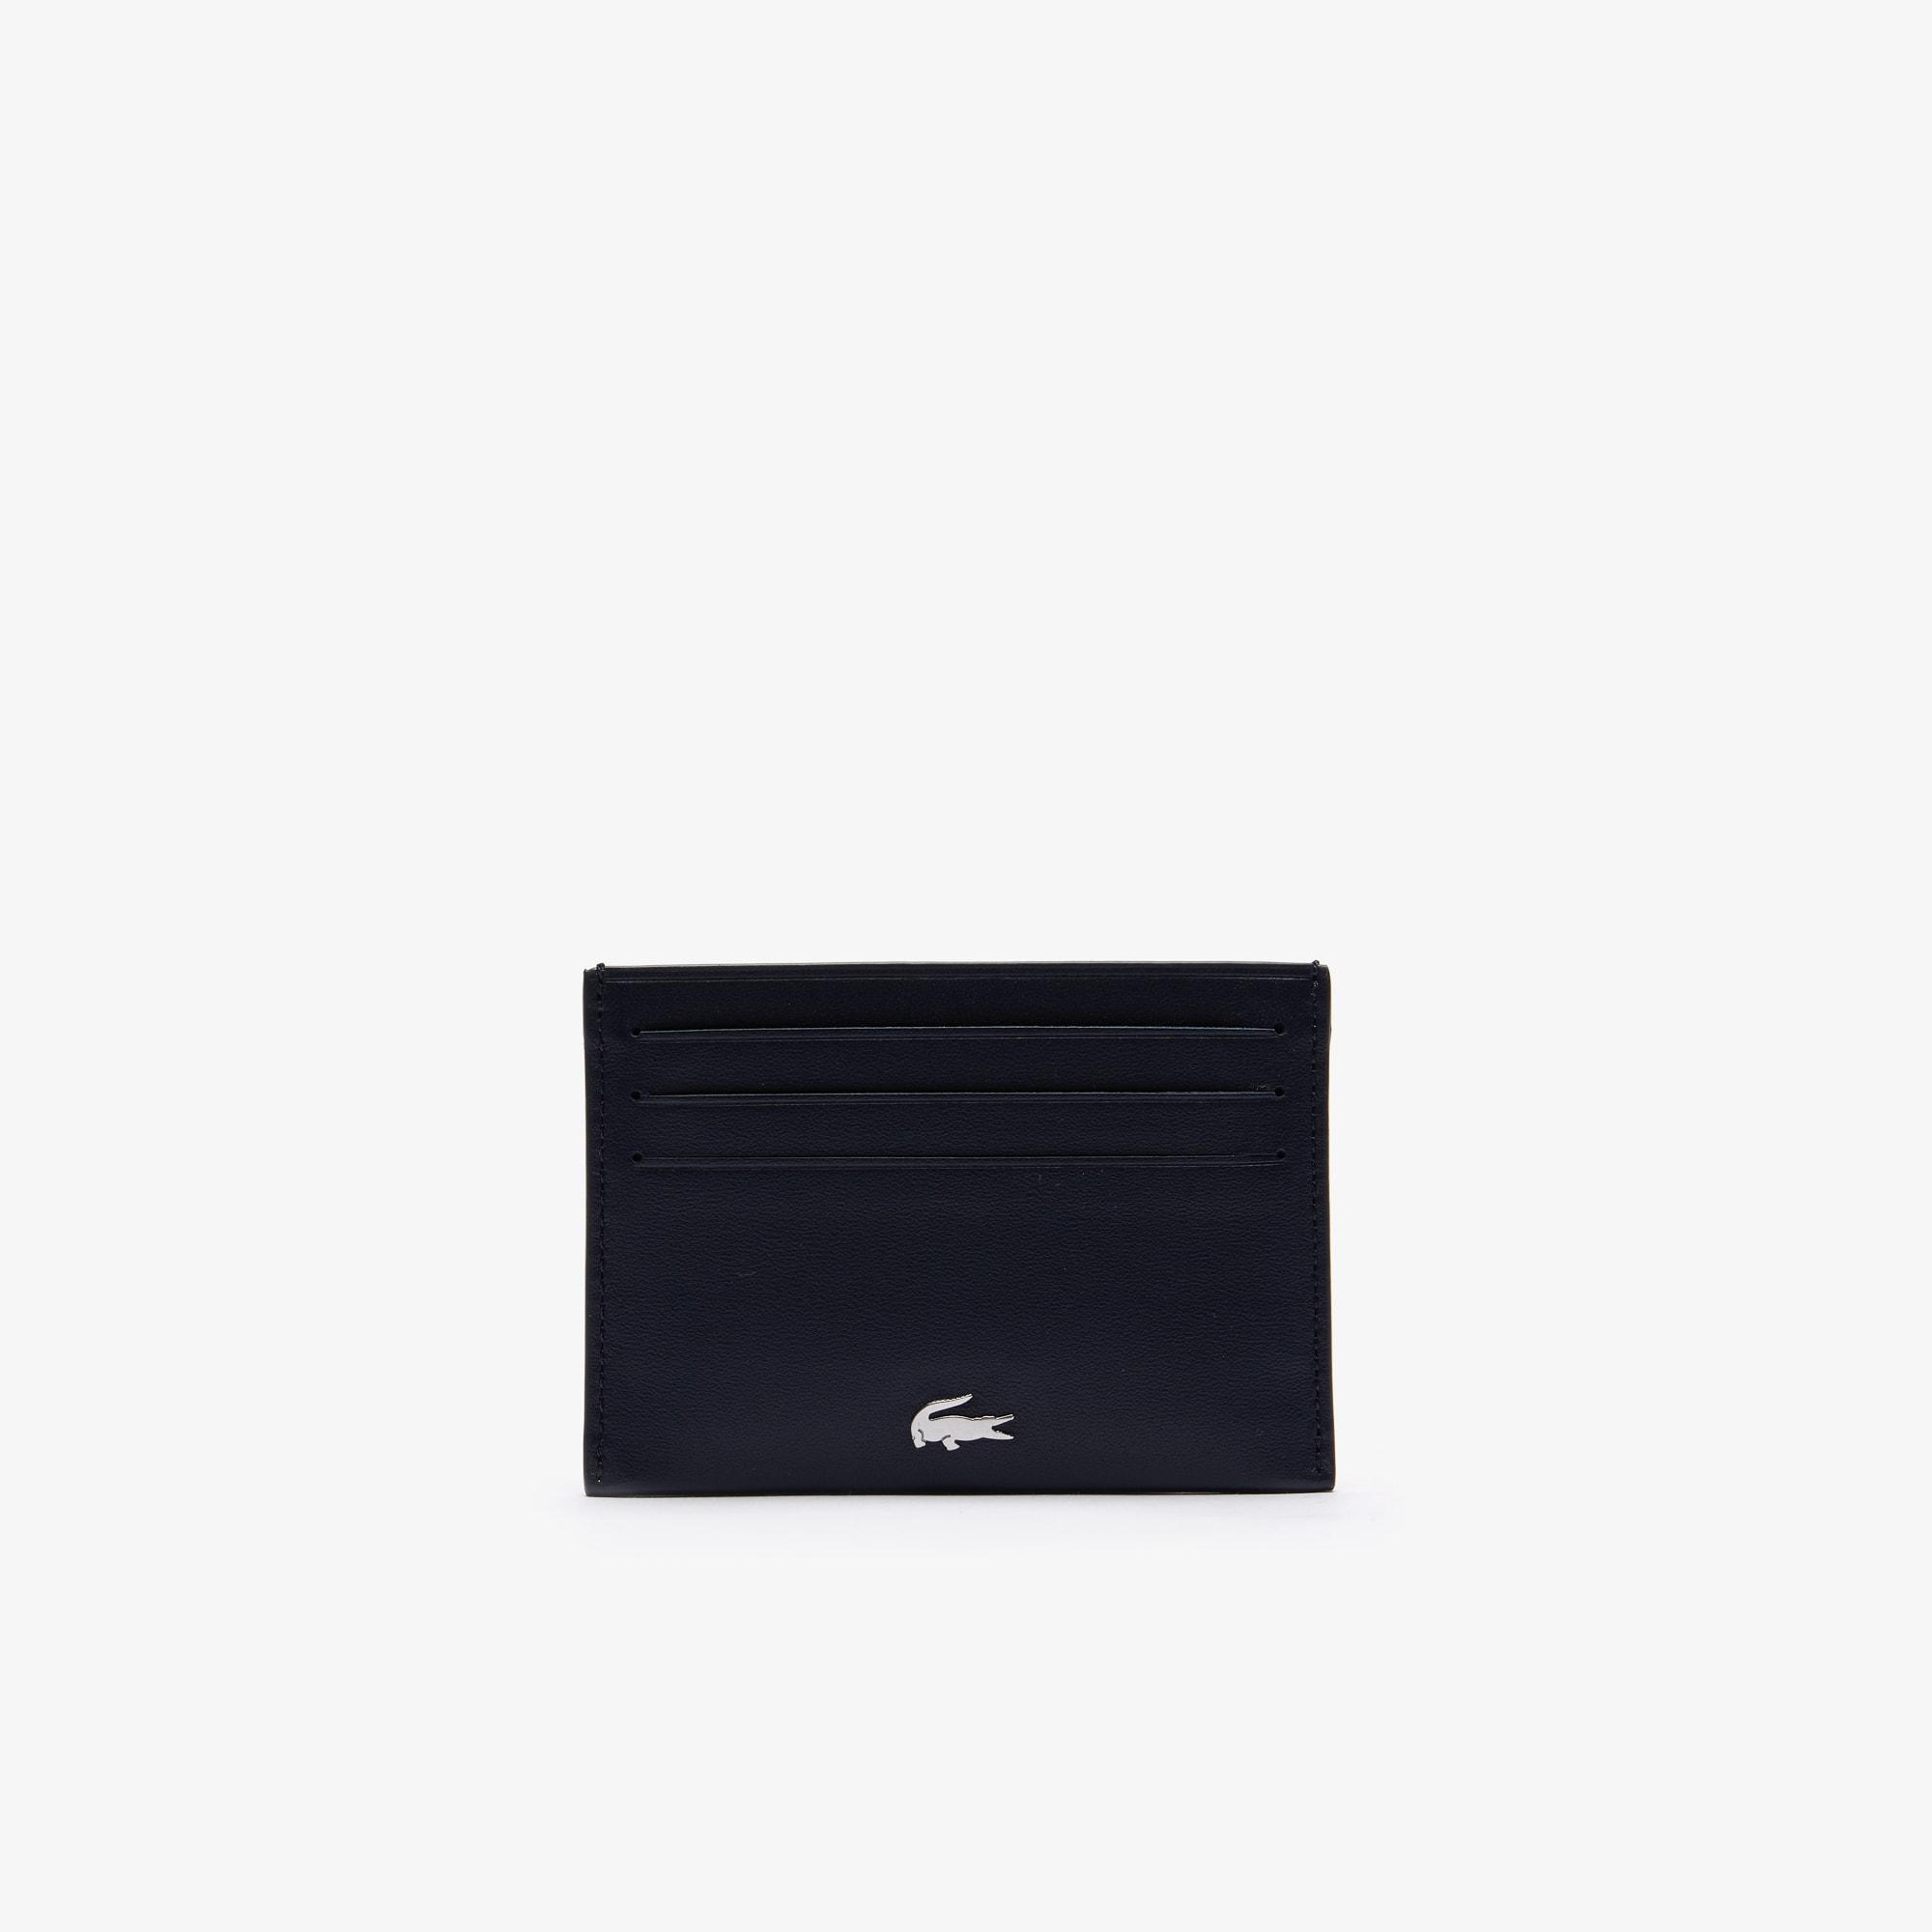 Men's FG credit card holder in leather